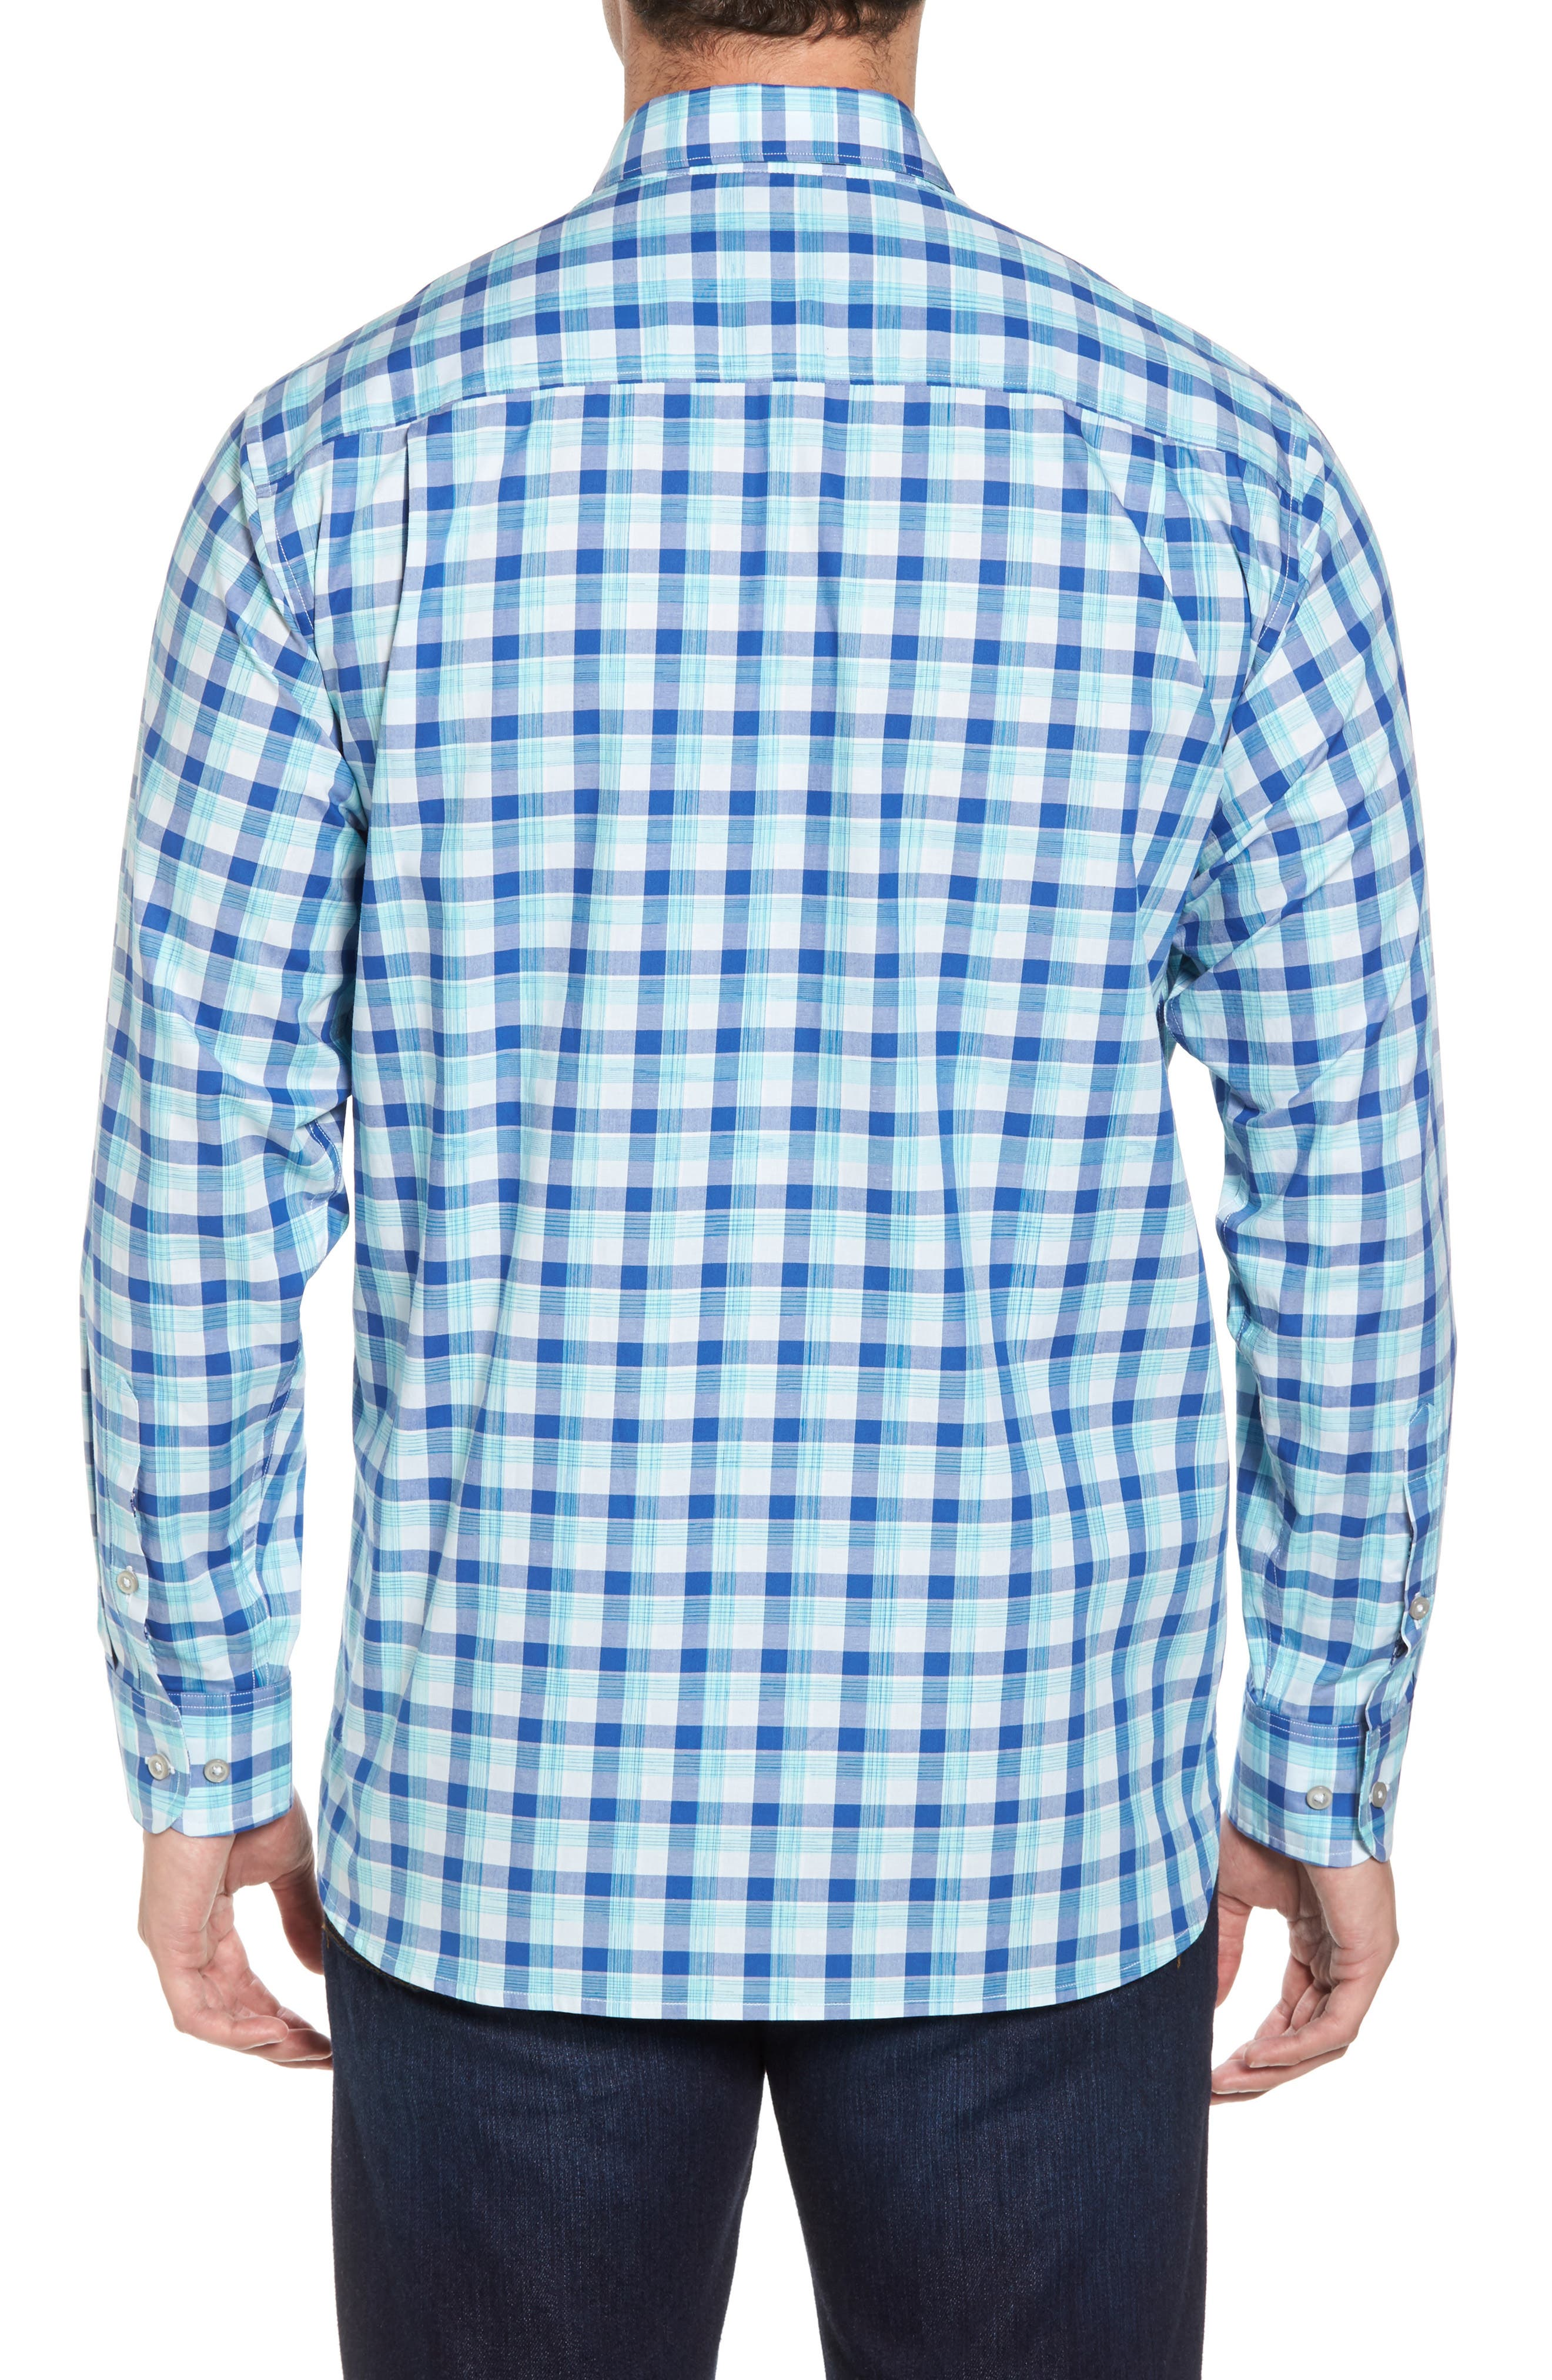 Alternate Image 2  - Tommy Bahama Atlantic Tides Classic Fit Plaid Sport Shirt